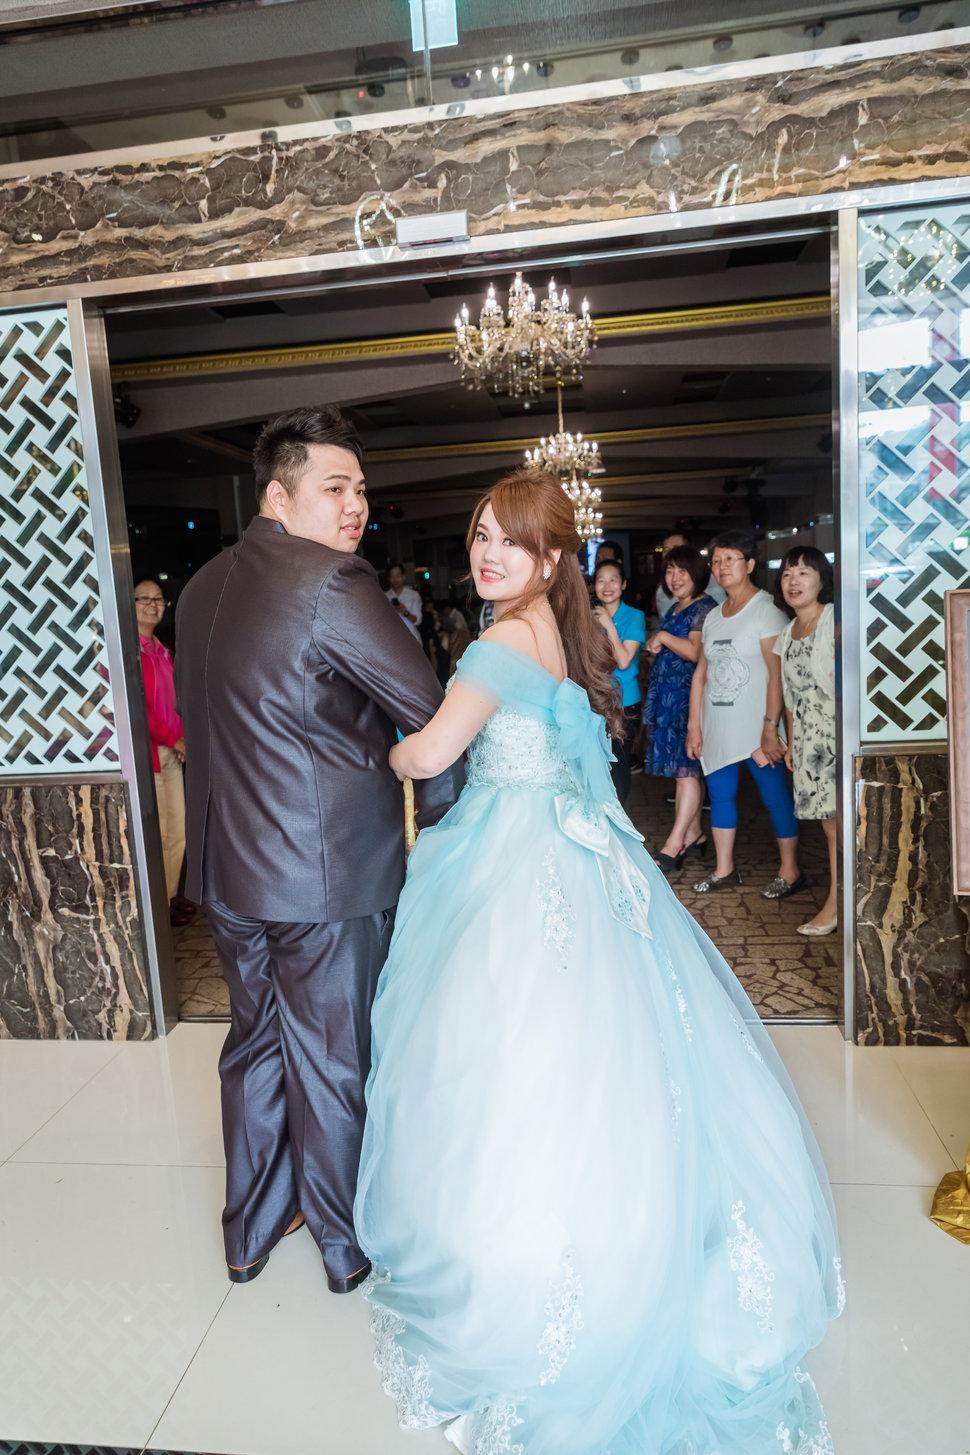 5D4_0588 - Promaker婚禮紀錄攝影團隊婚攝豪哥《結婚吧》